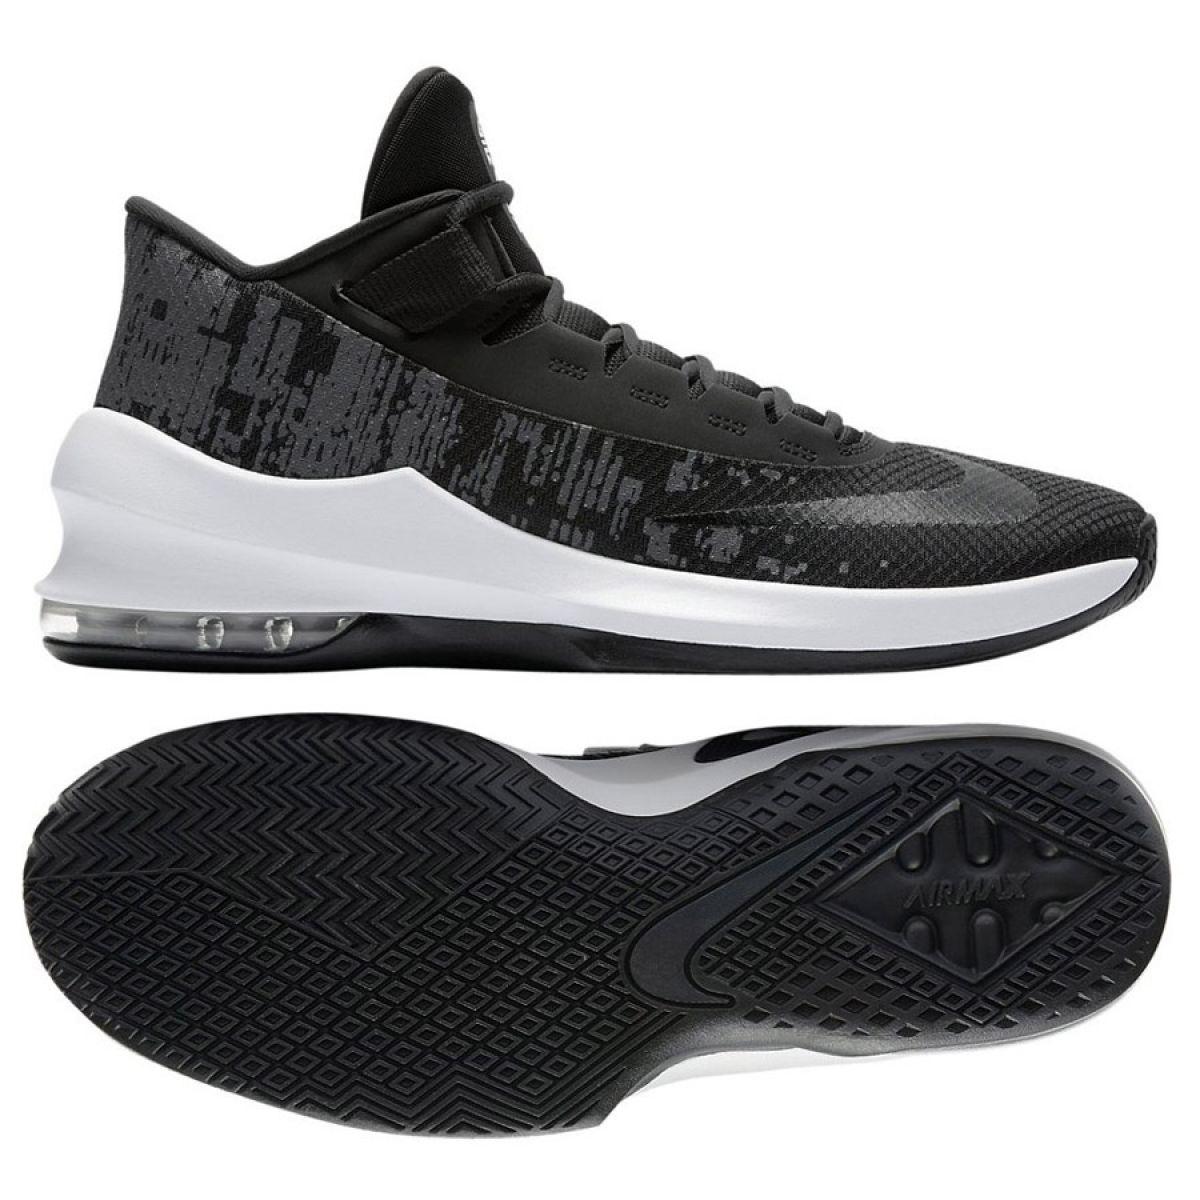 5f04befb7418e Basketbalové boty Nike Air Max Infuriate 2 Mid M AA7066-001 ...